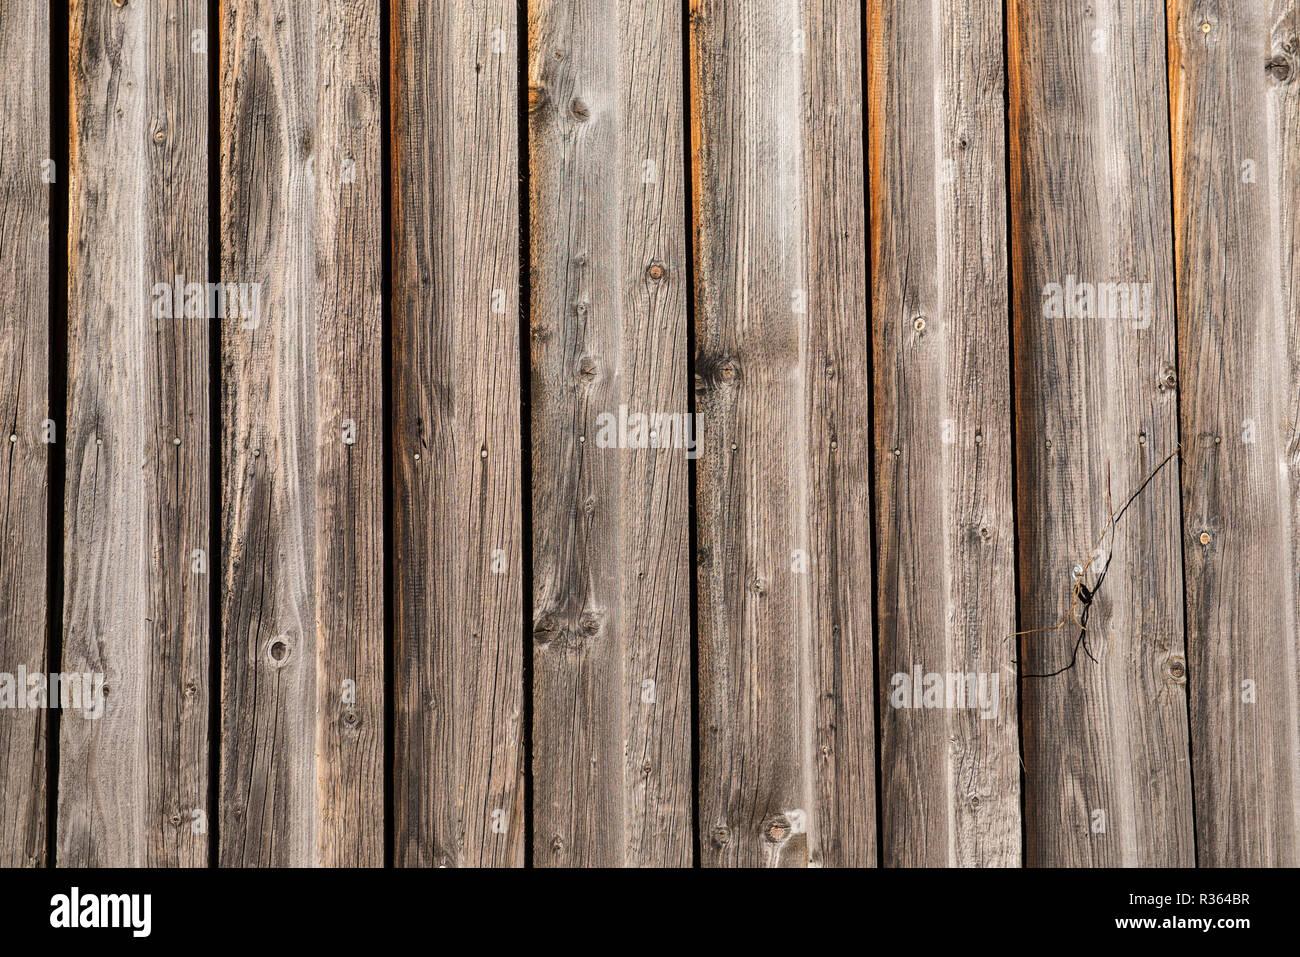 wand aus holz photos & wand aus holz images - alamy